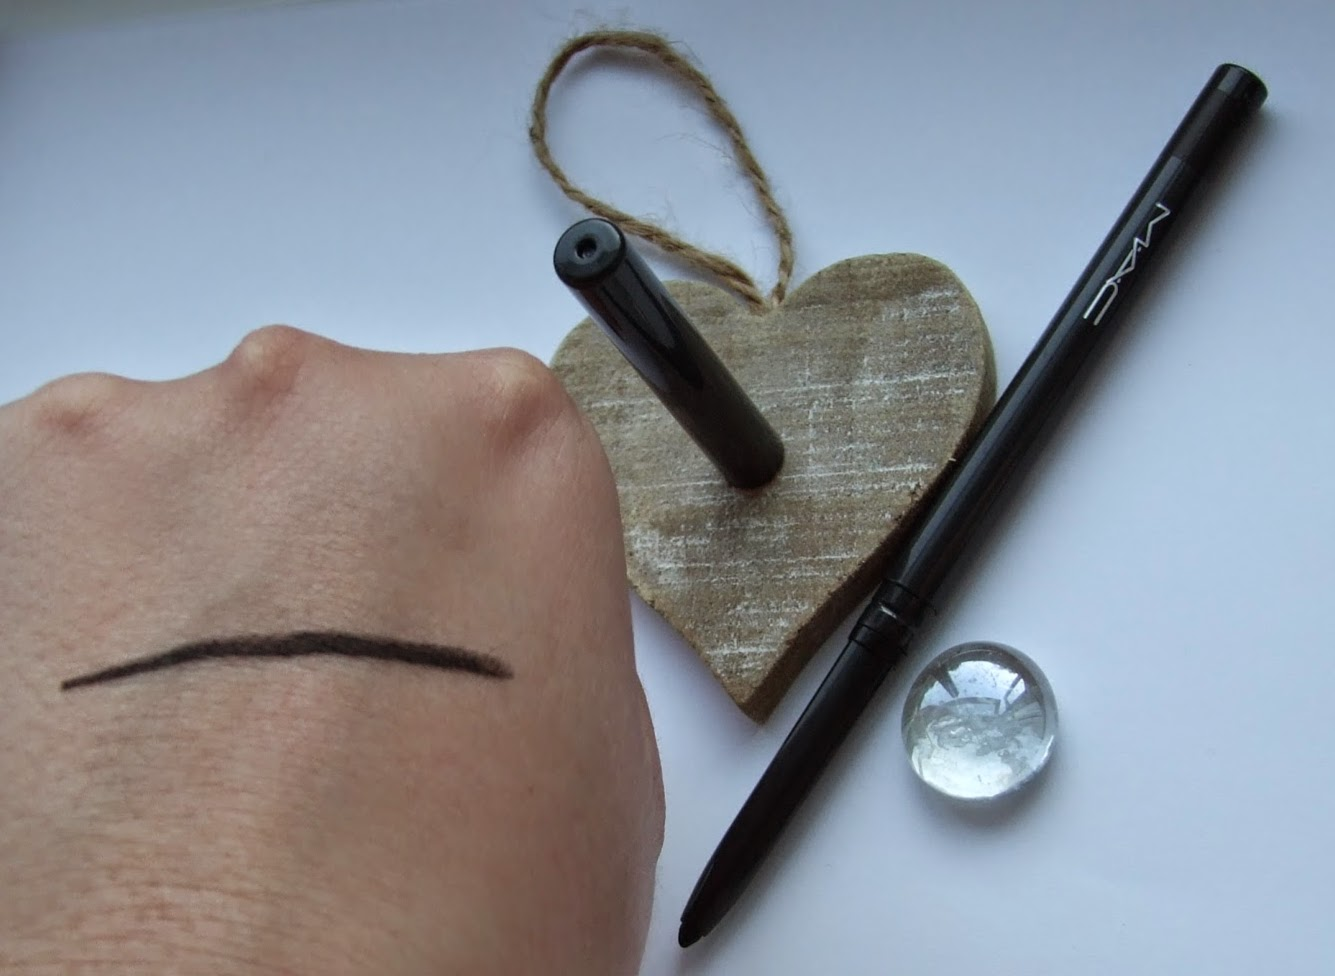 MAC A Novel Romance Fluidline eye pencil eyeliner black brilliance swatches